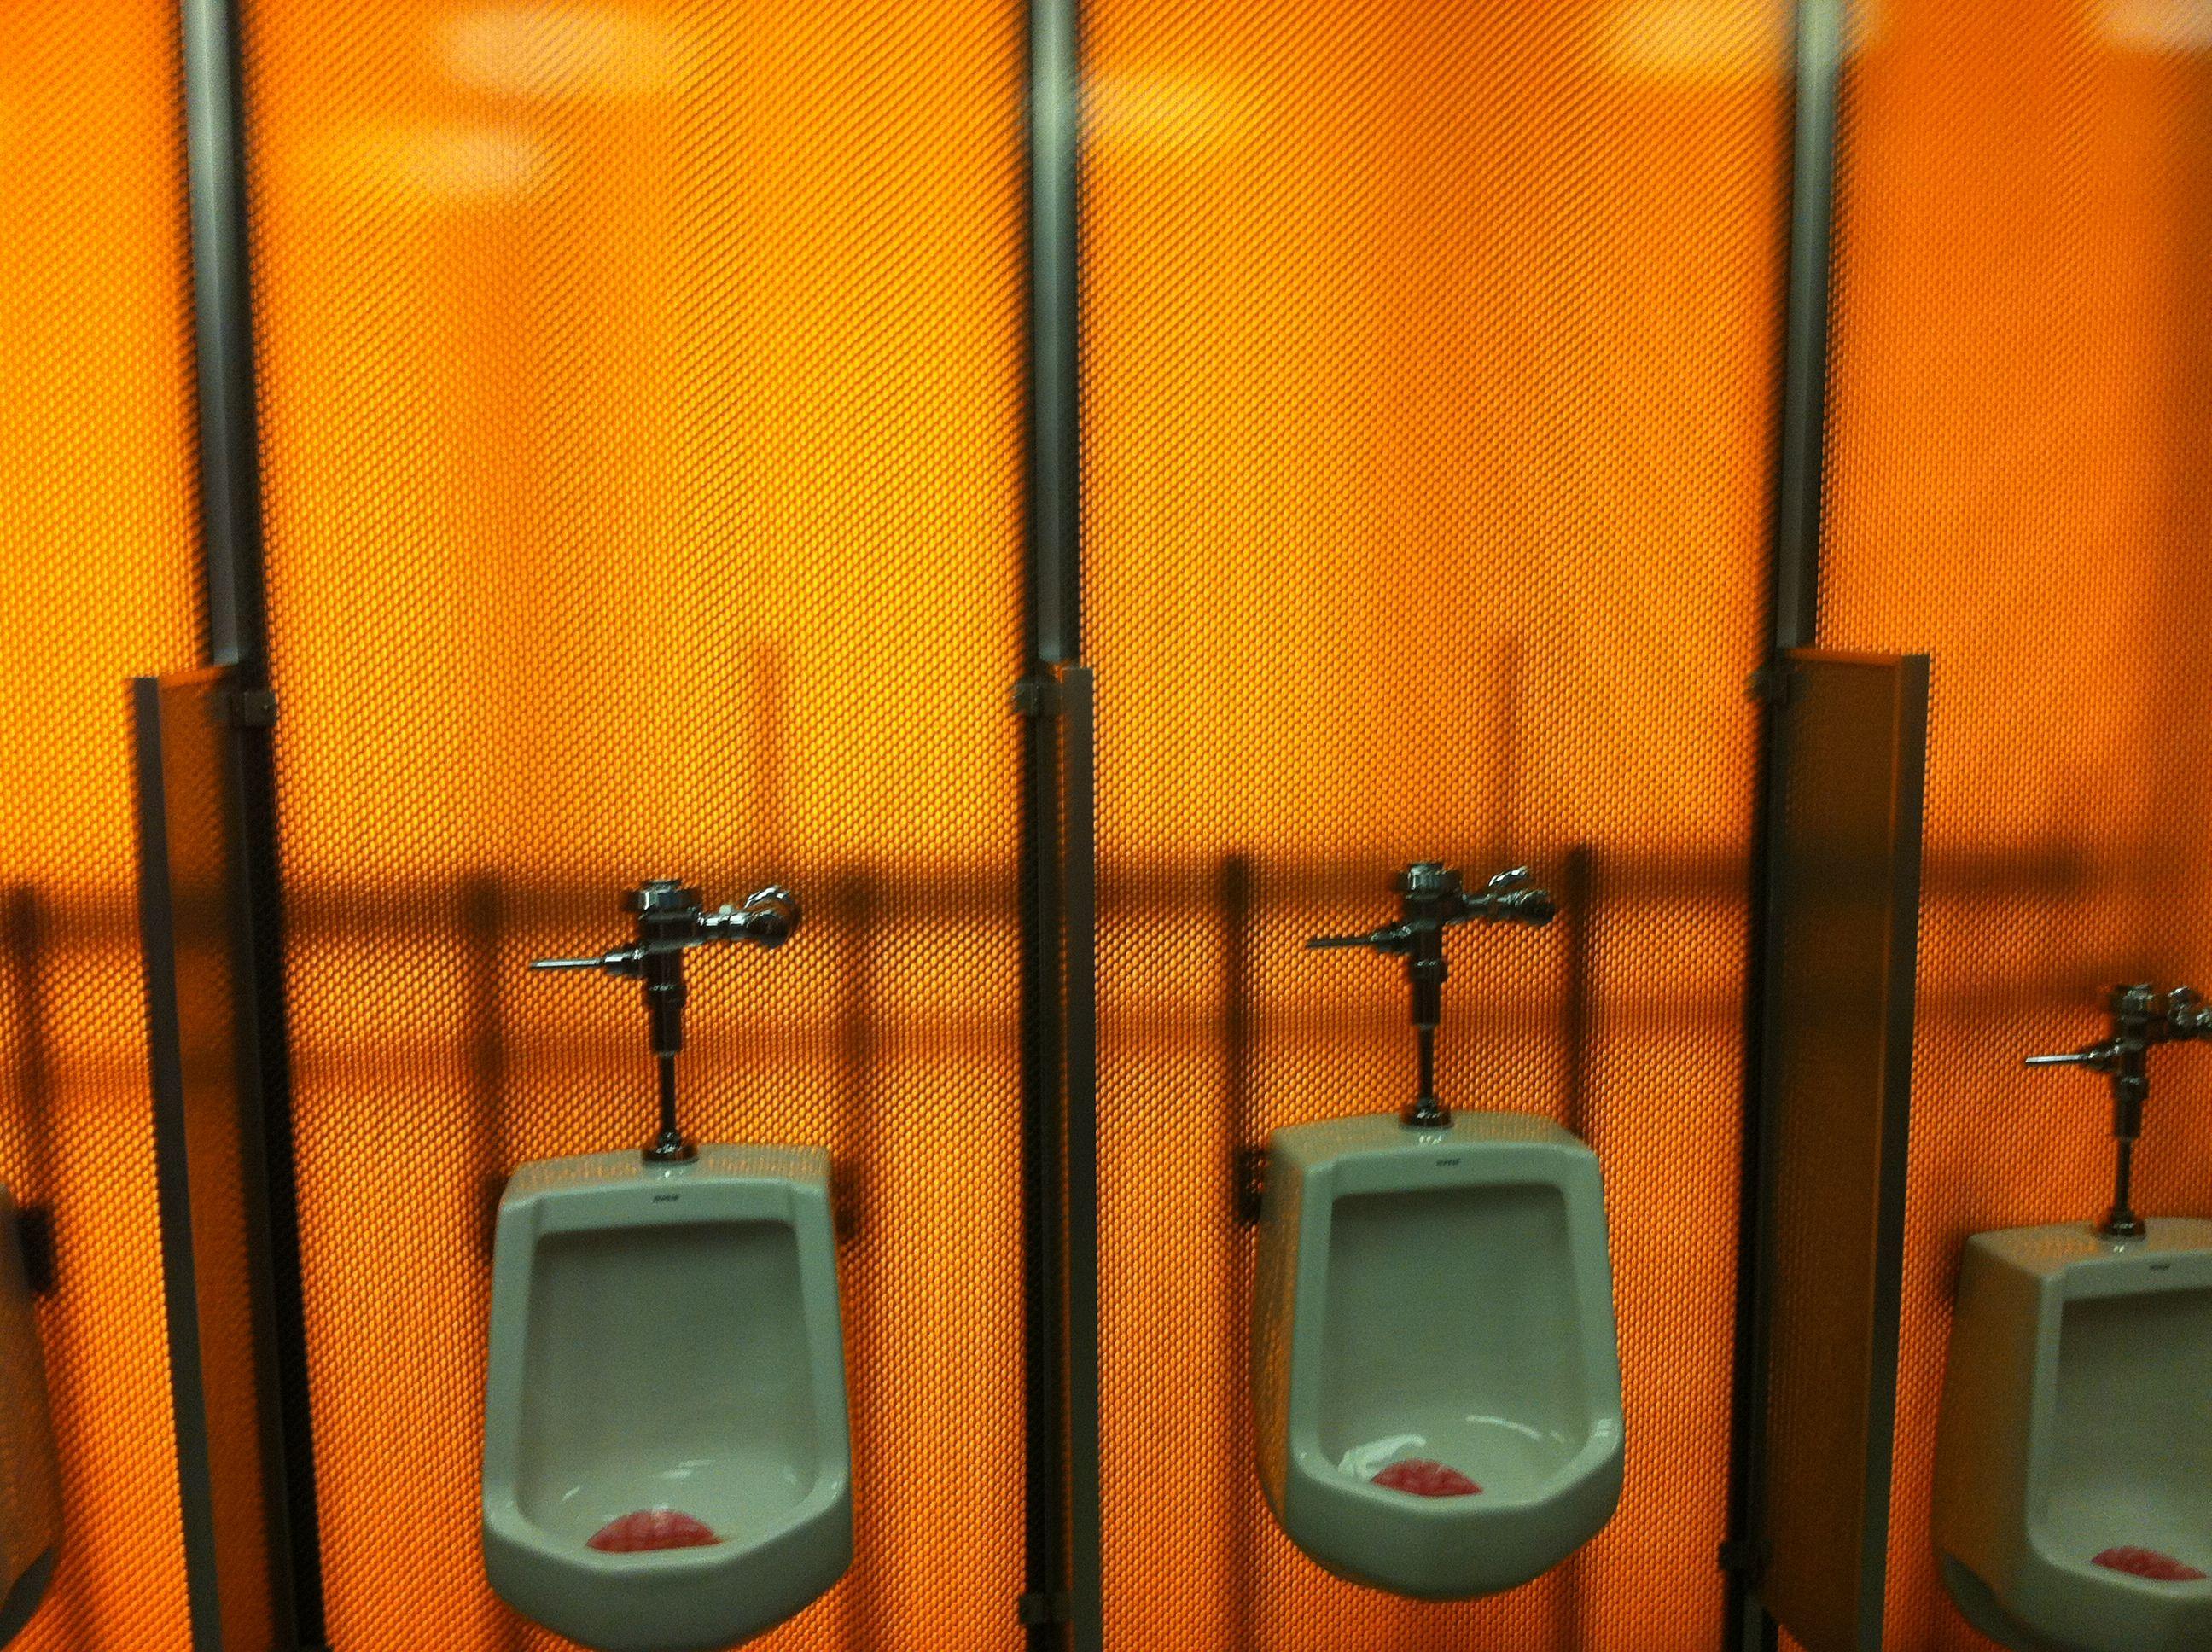 Bathrroms Inside The Mccormick Tribune Campus Center At The